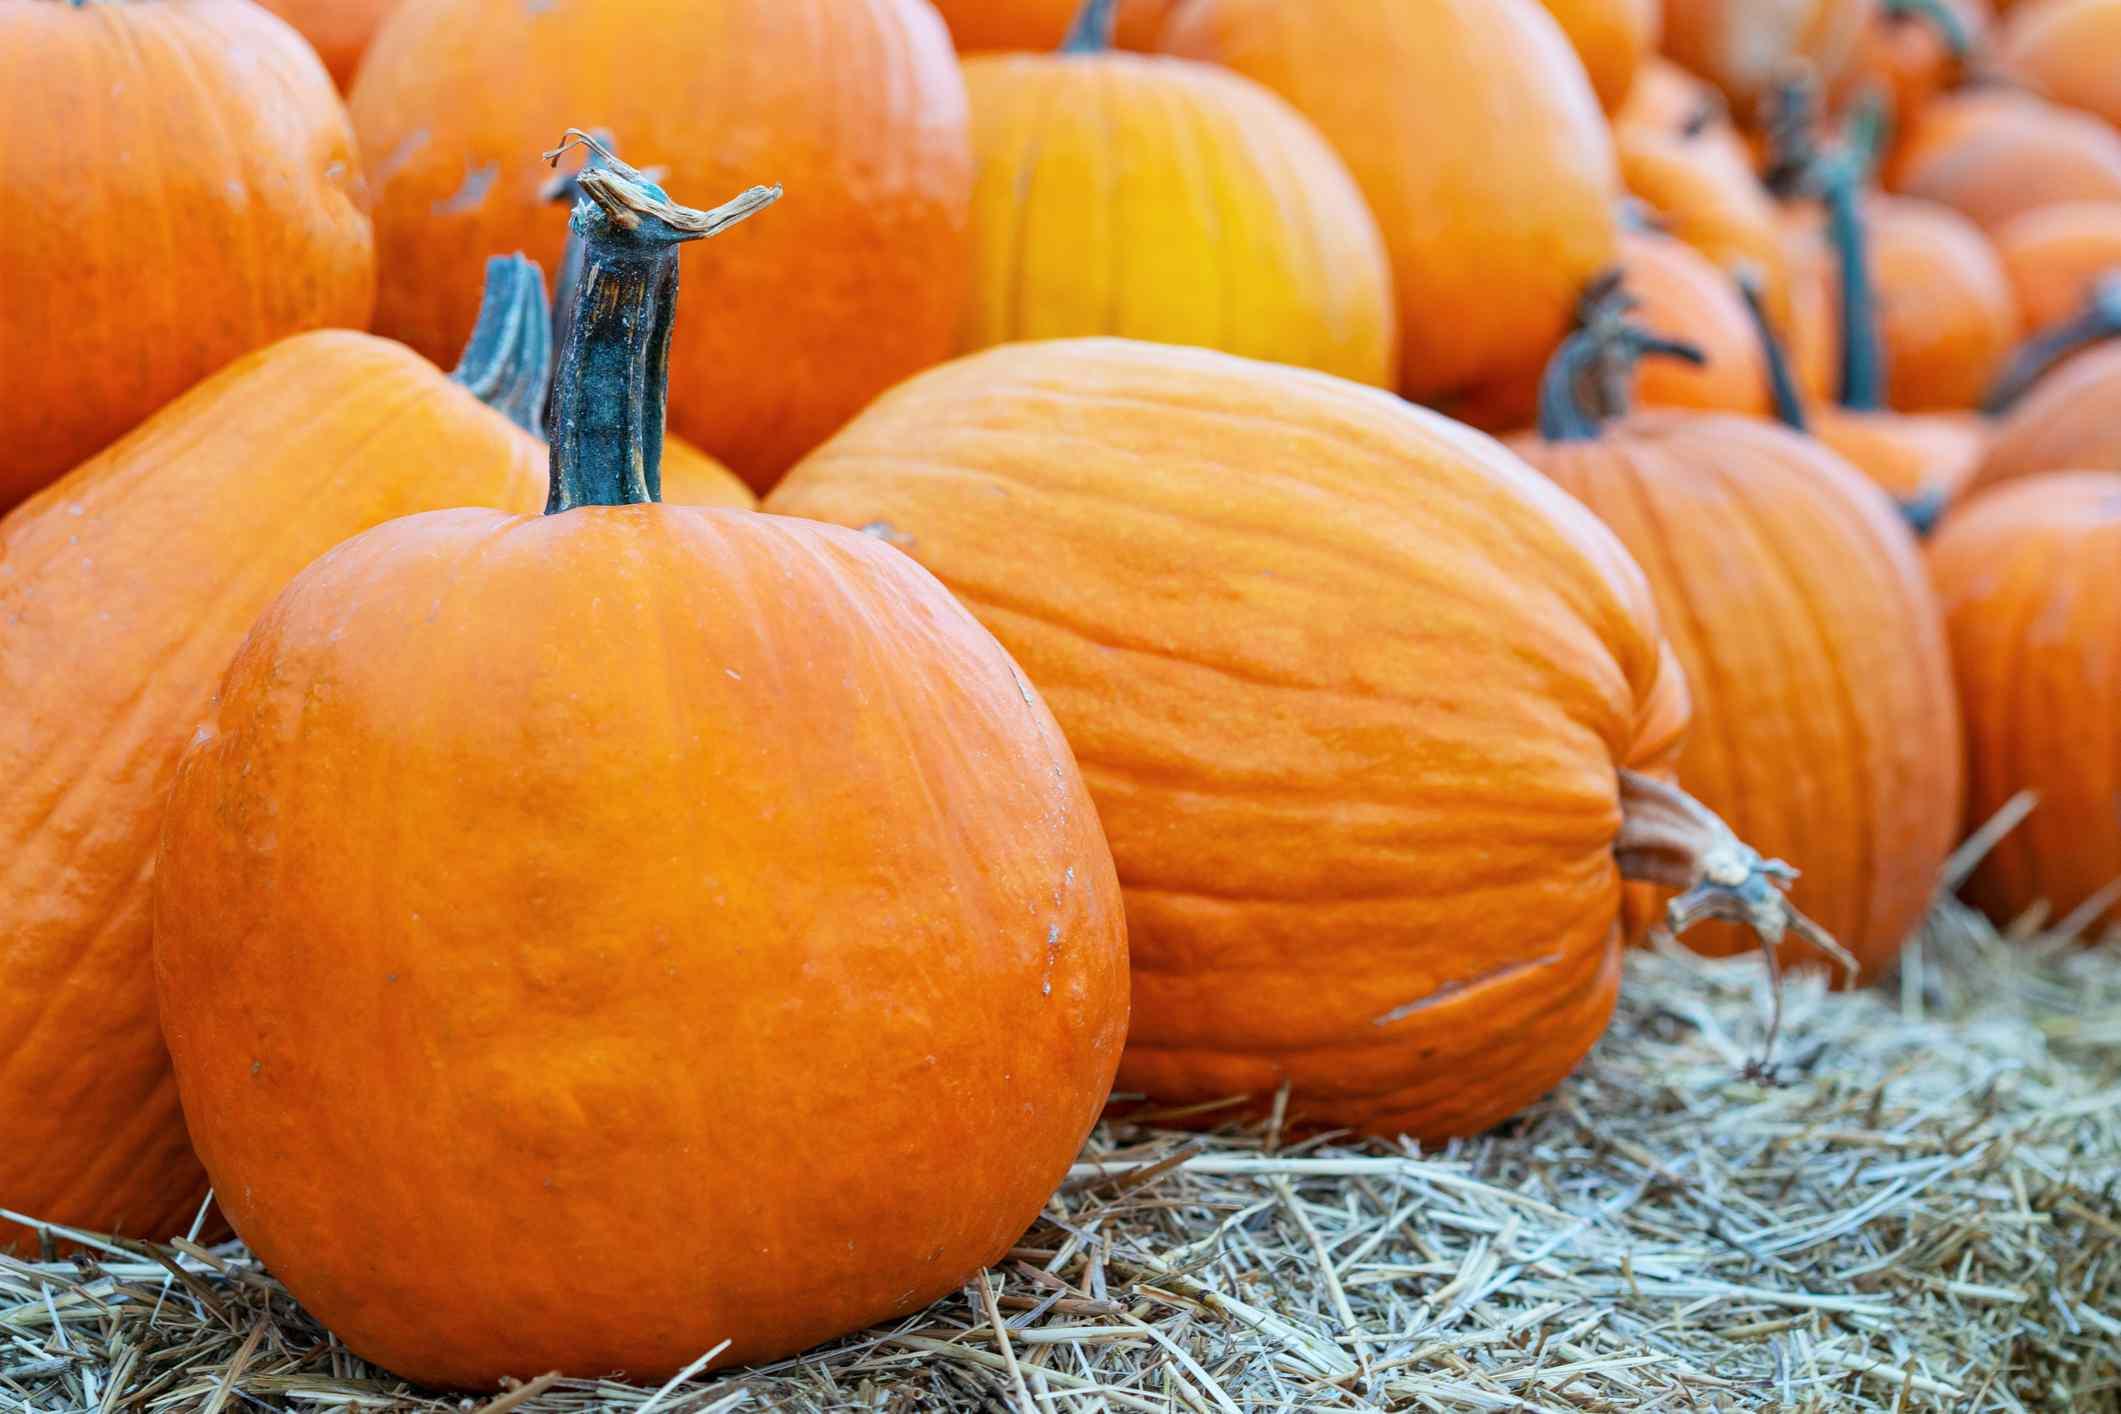 Freshly pile of orange pumpkins at outdoor Halloween local fair